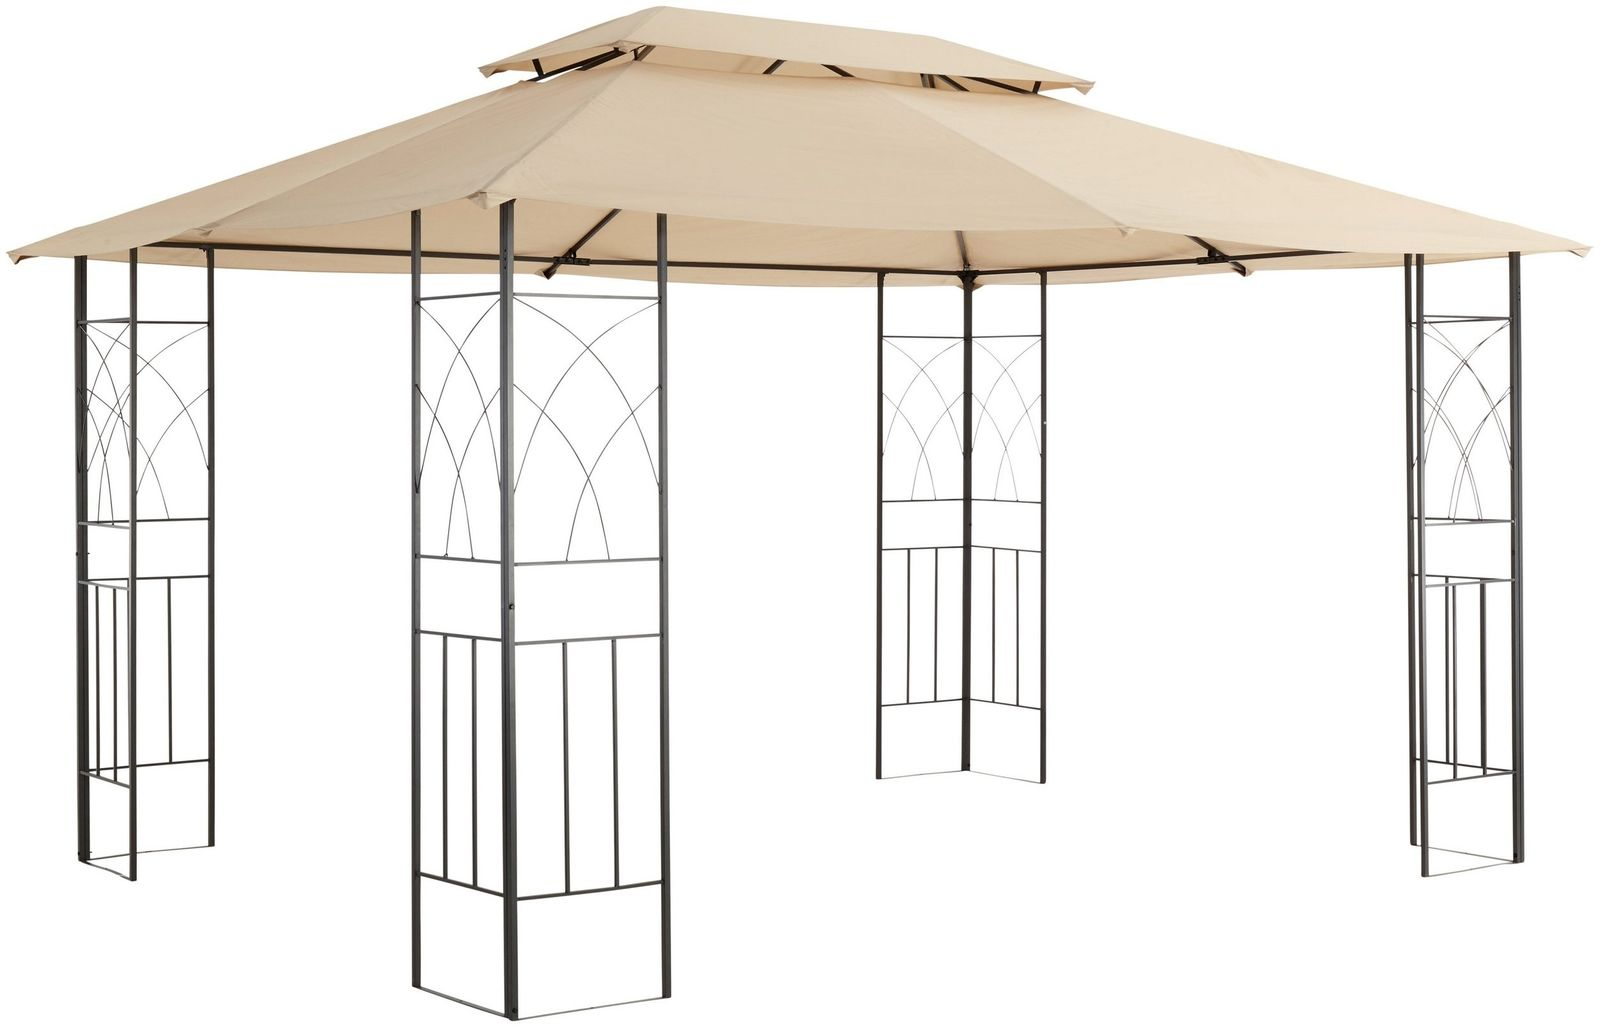 pavillon 3x4 dach ohne seitenteile polyester sand stahl anthrazit 7220482 kaufen bei felis. Black Bedroom Furniture Sets. Home Design Ideas